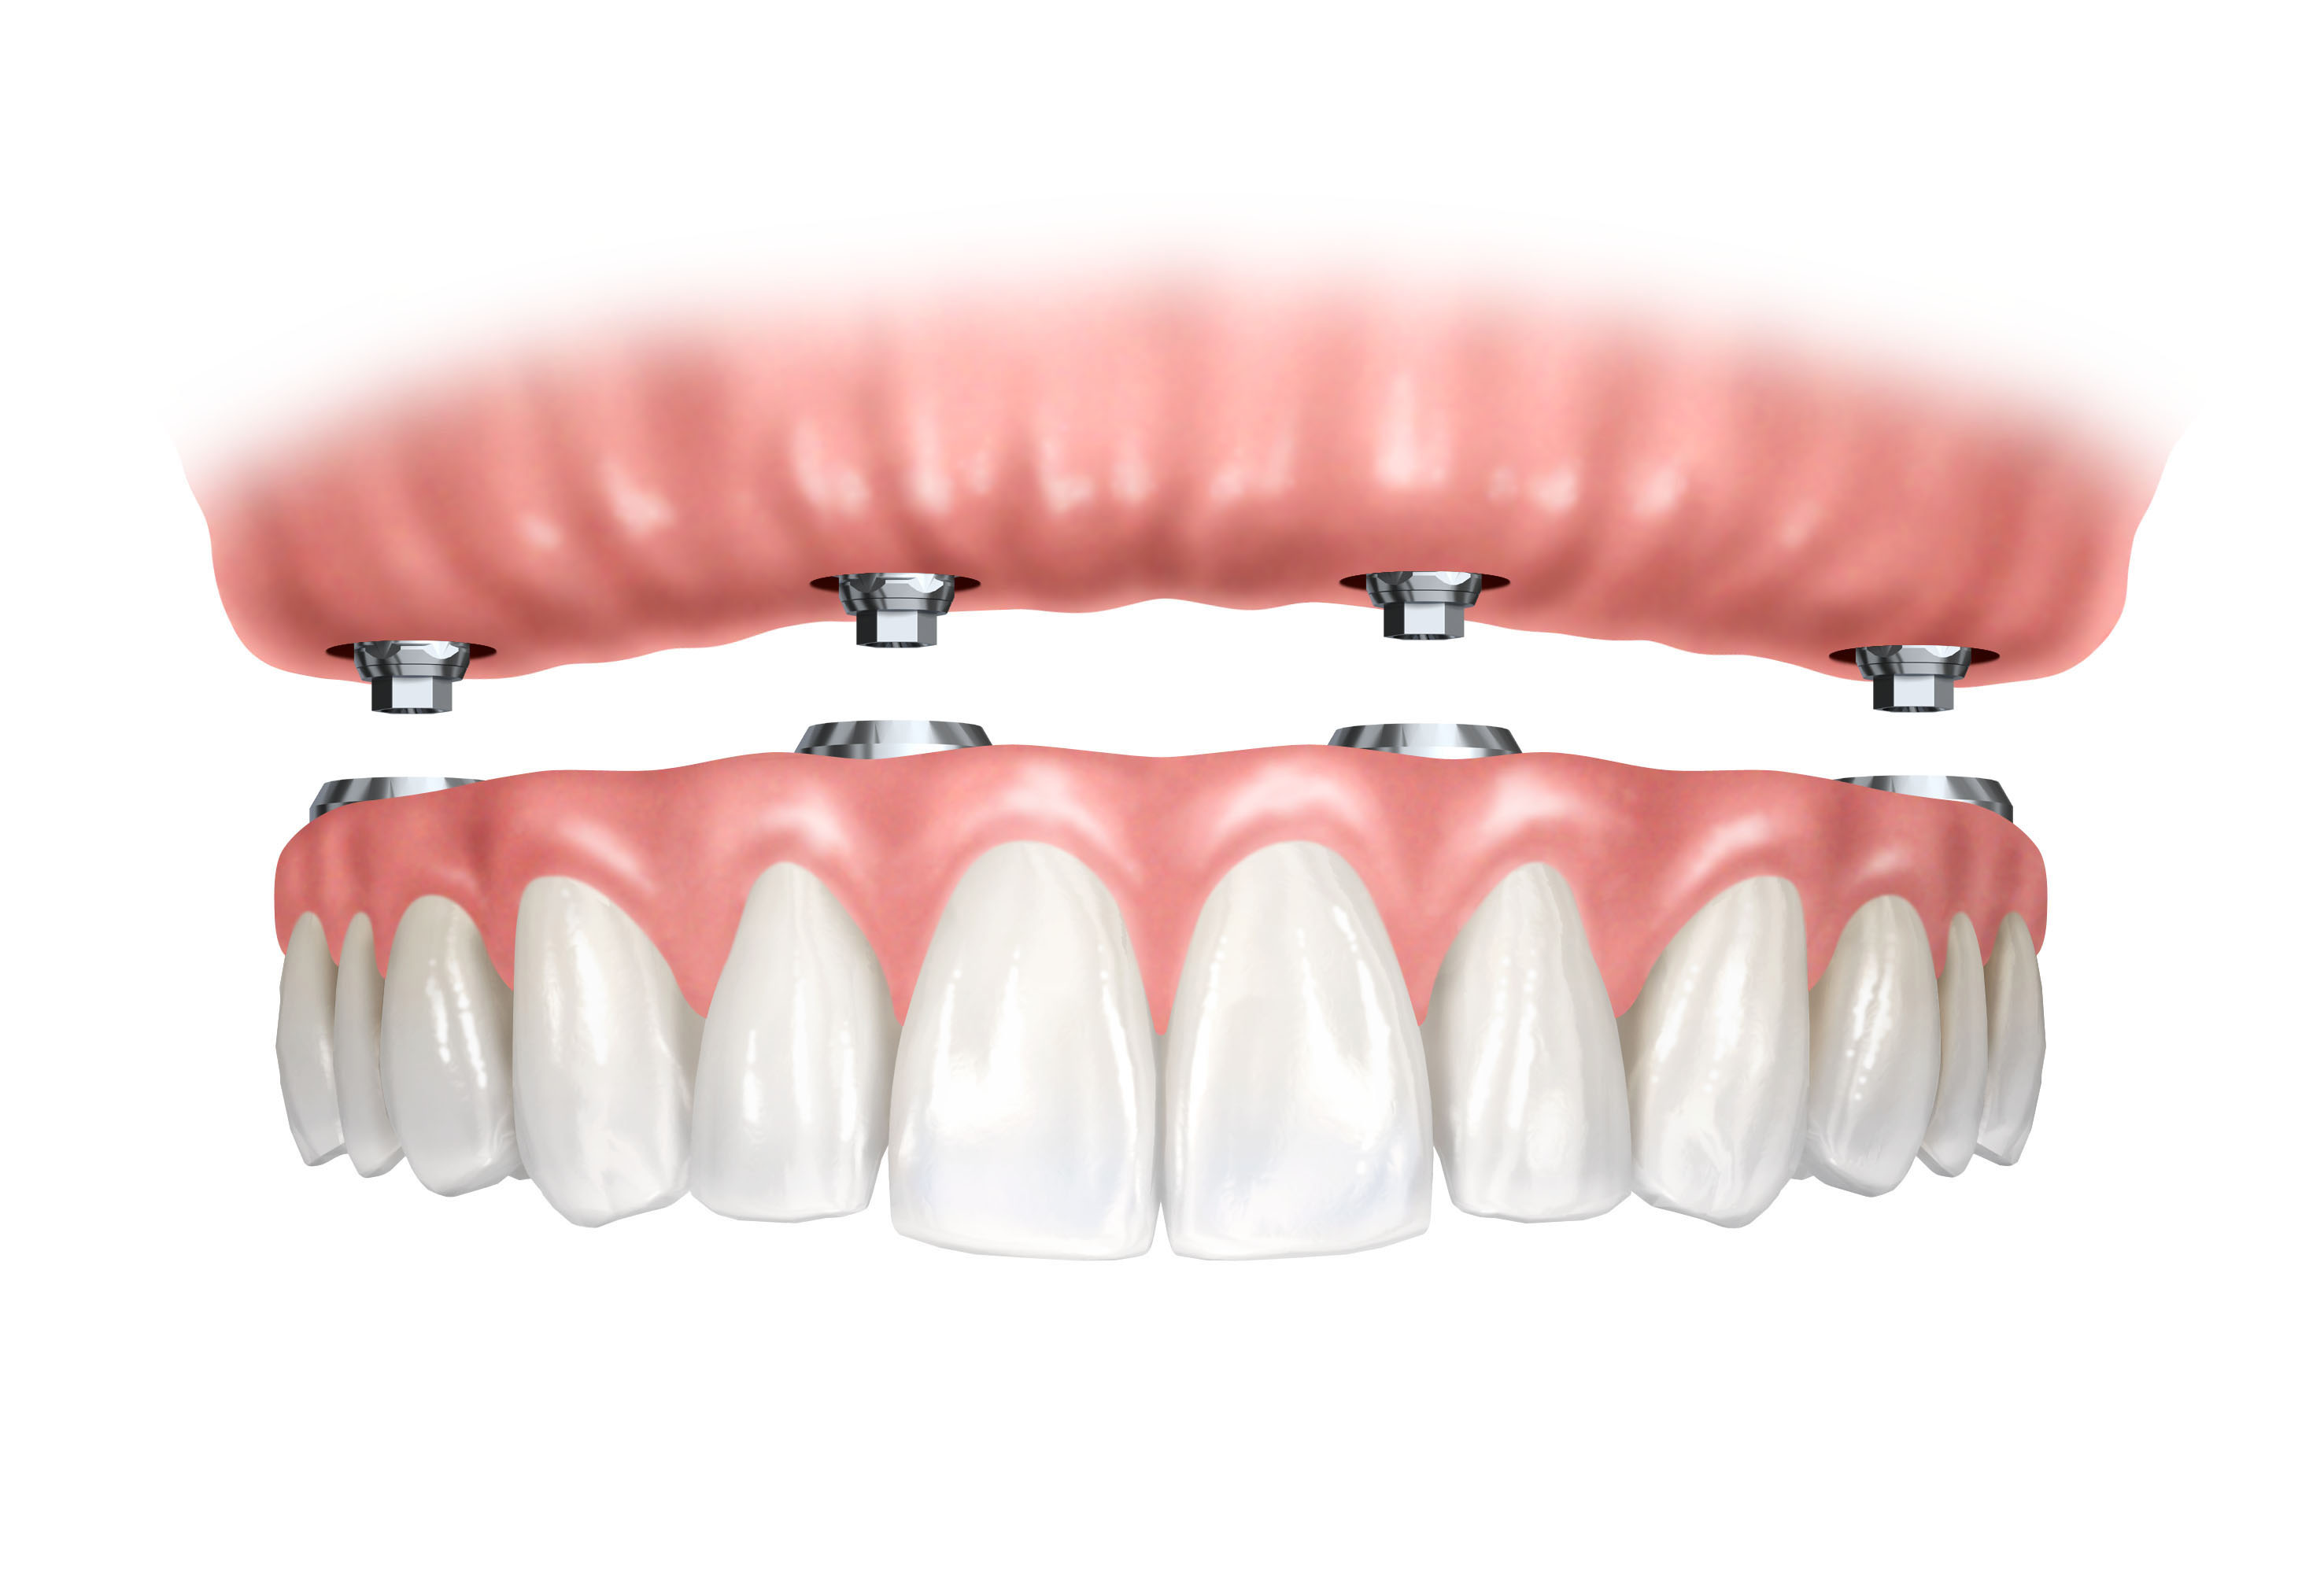 Dentures Canyon Dental Best Dentist In Orem Utah